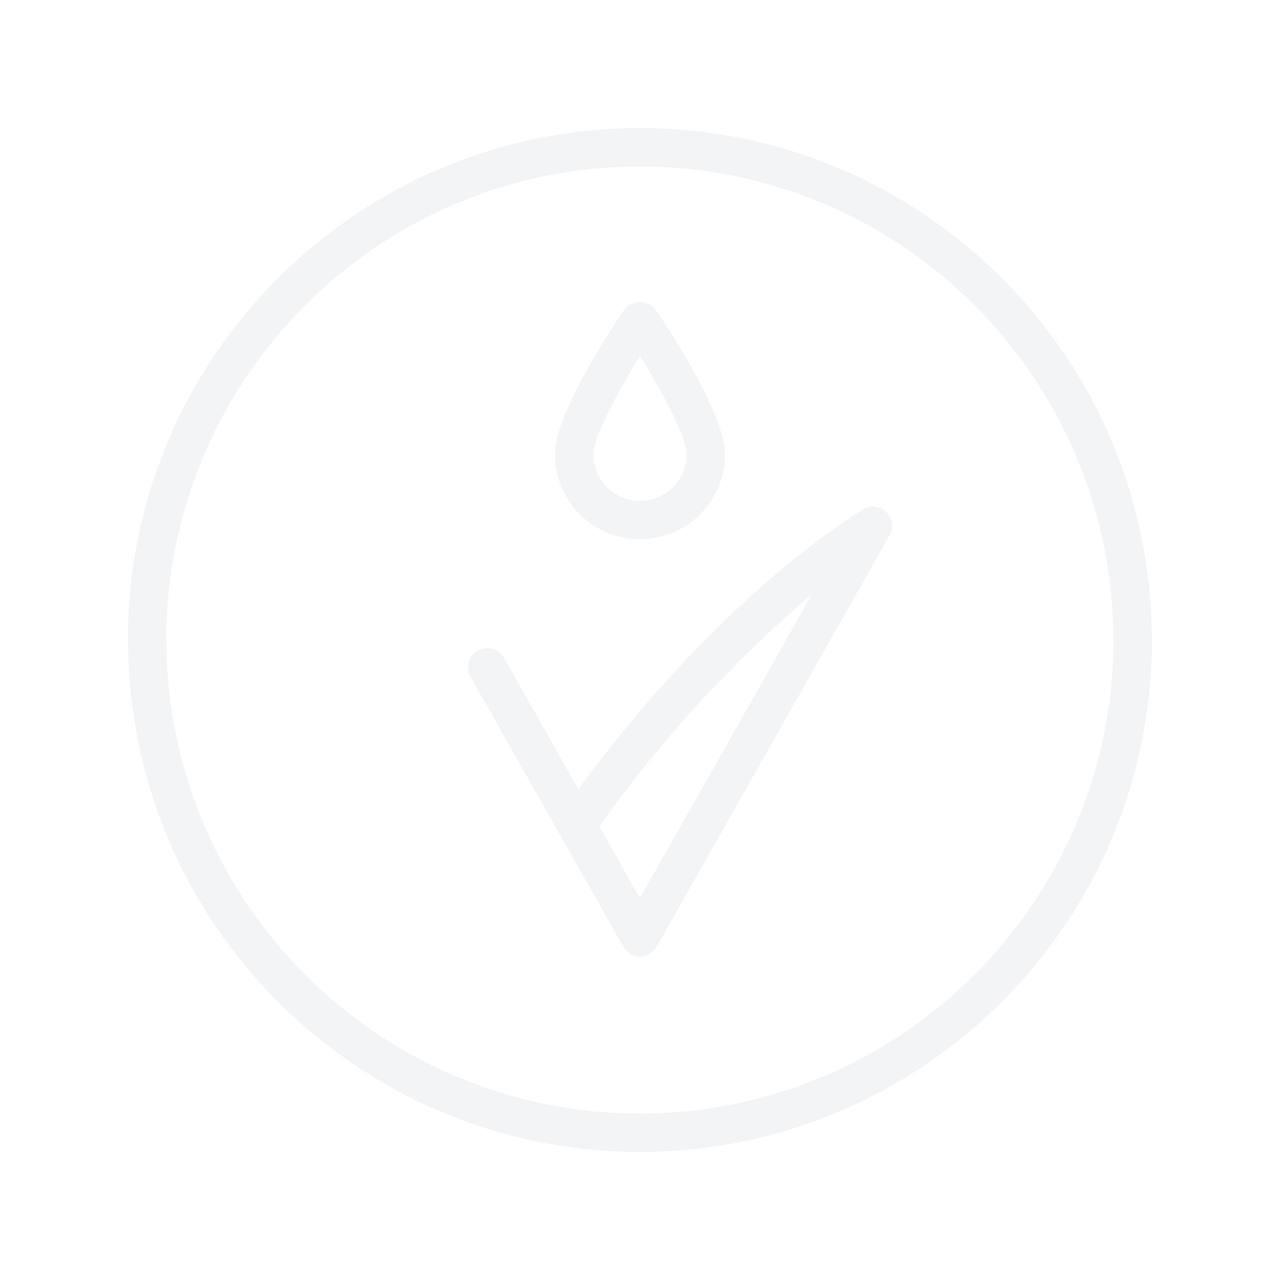 TONYMOLY The Chok Chok Green Tea Watery Essence 50ml